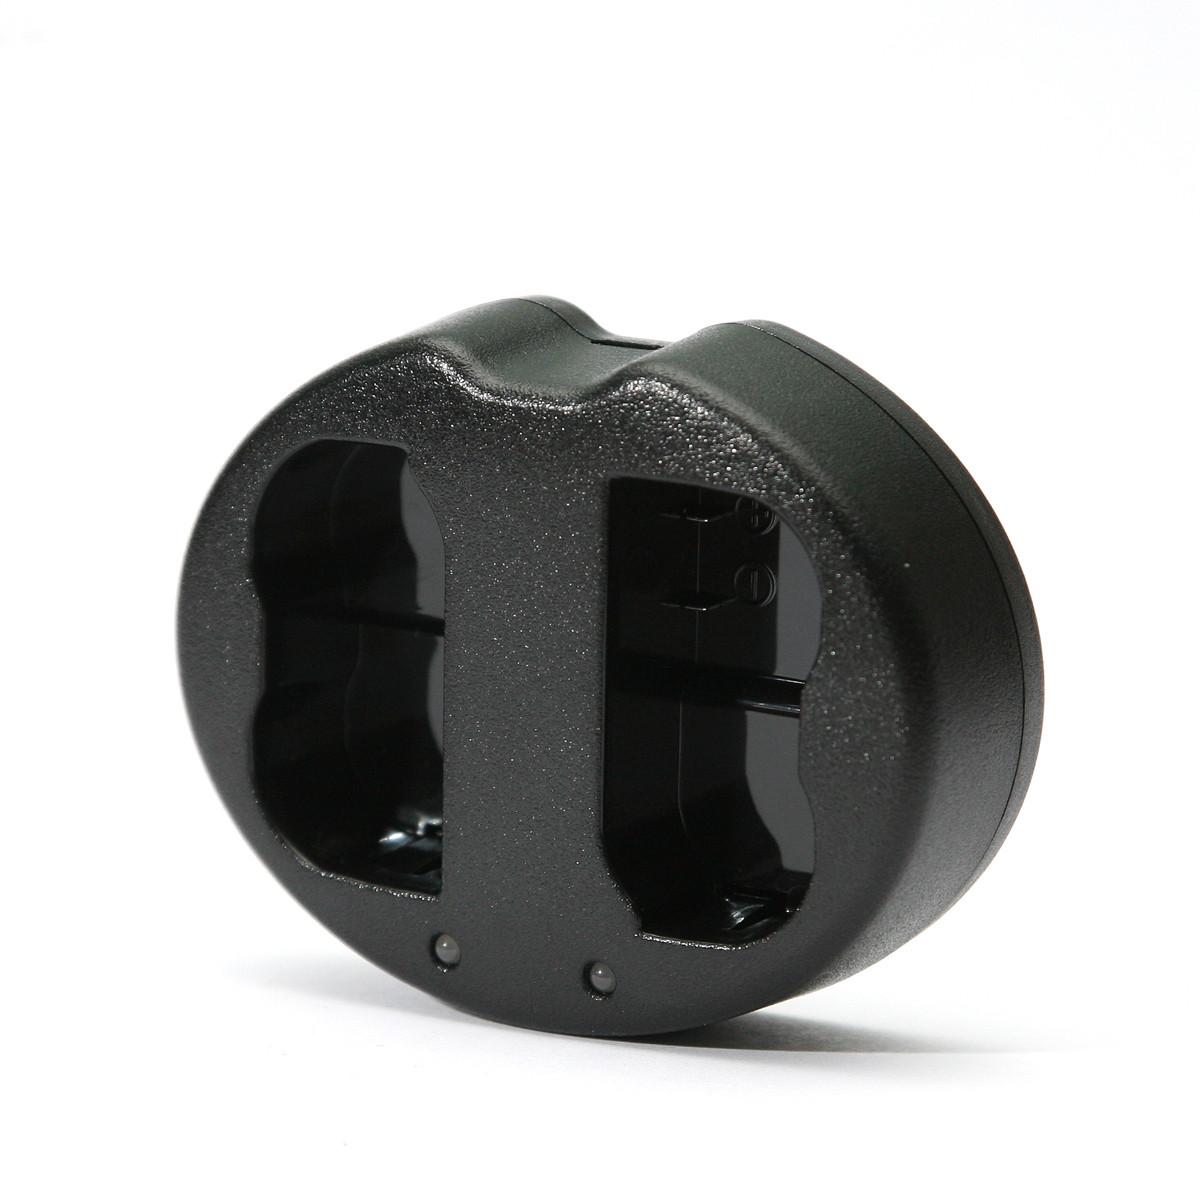 Зарядное устройство PowerPlant  Dual Nikon EN-EL15 для двух аккумуляторов